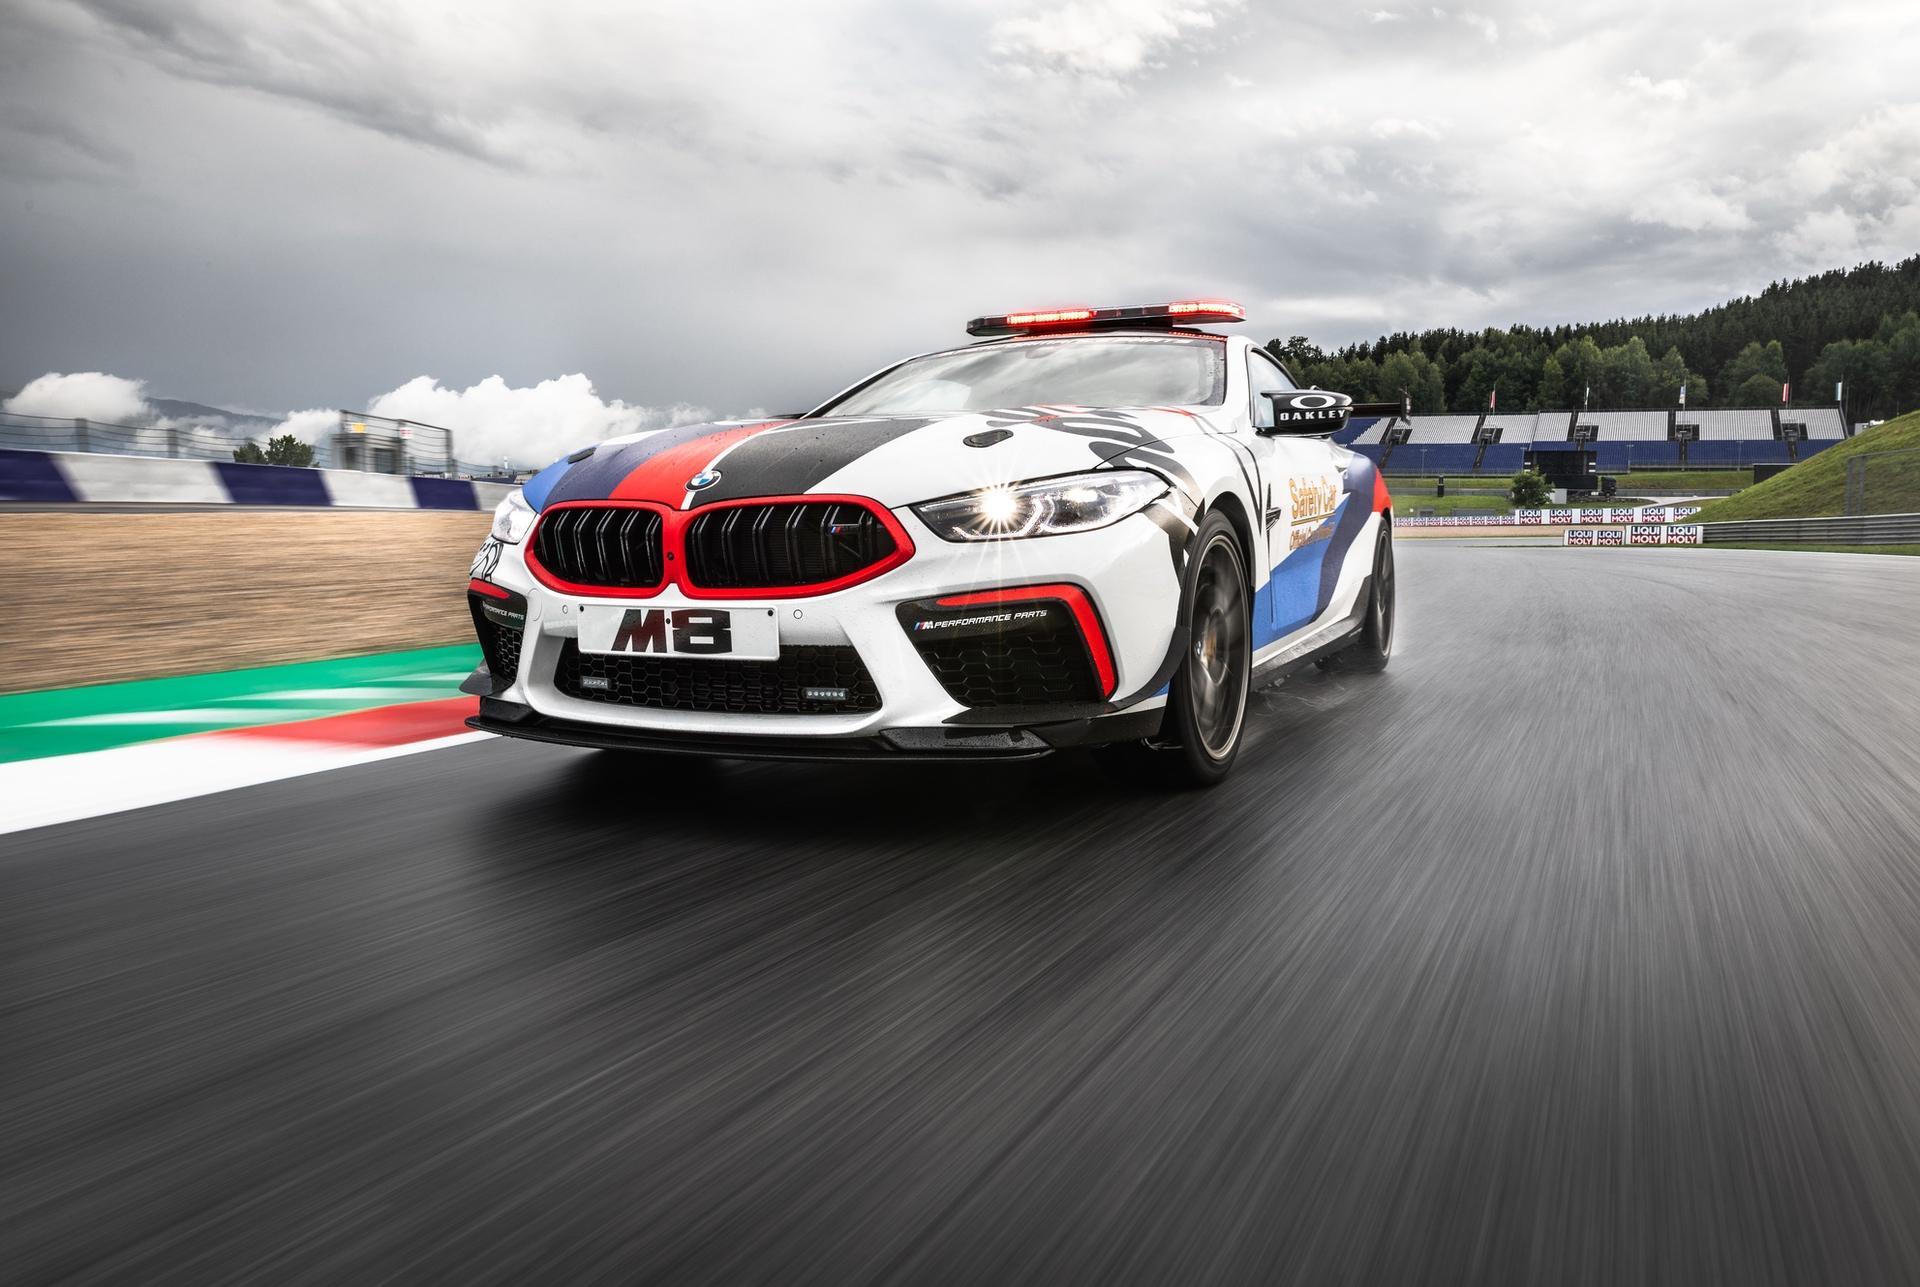 BMW_M8_MotoGP_Safety_Car_0005